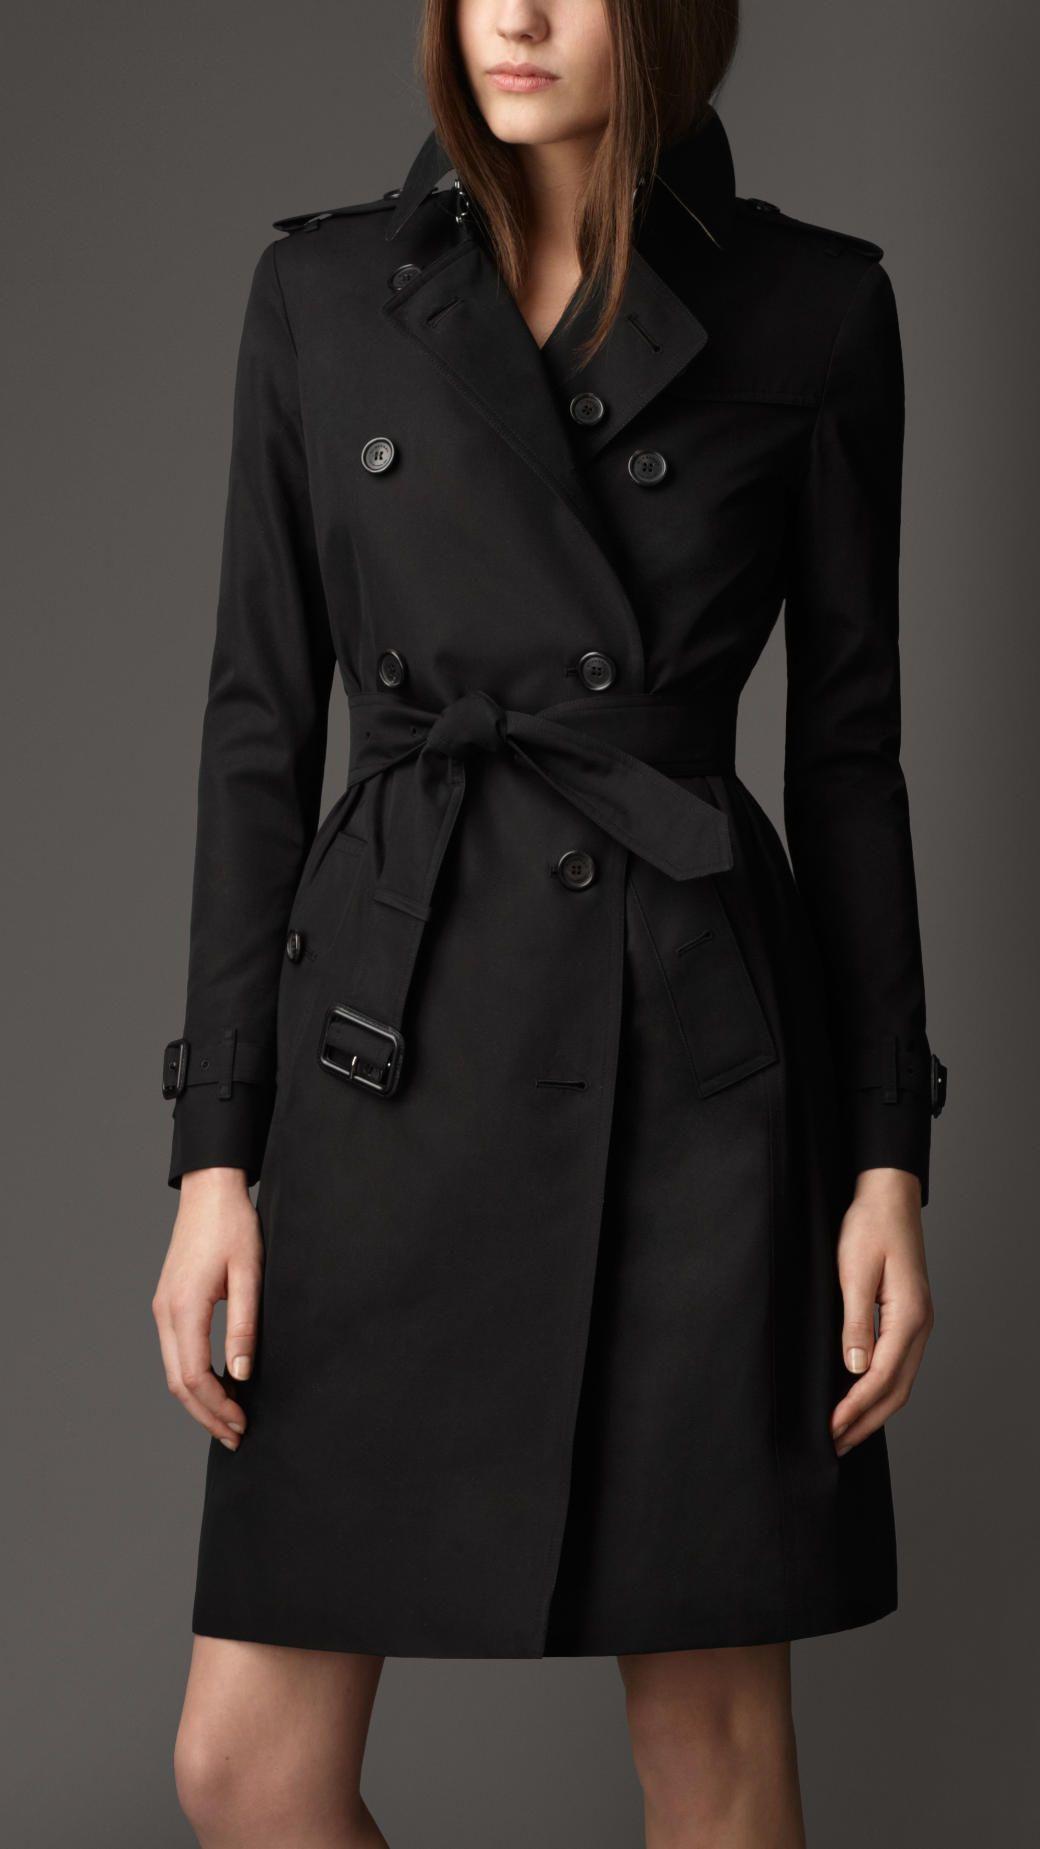 35add3a8e5 Burberry Long Cotton Gabardine Trench Coat in Black (jet black)